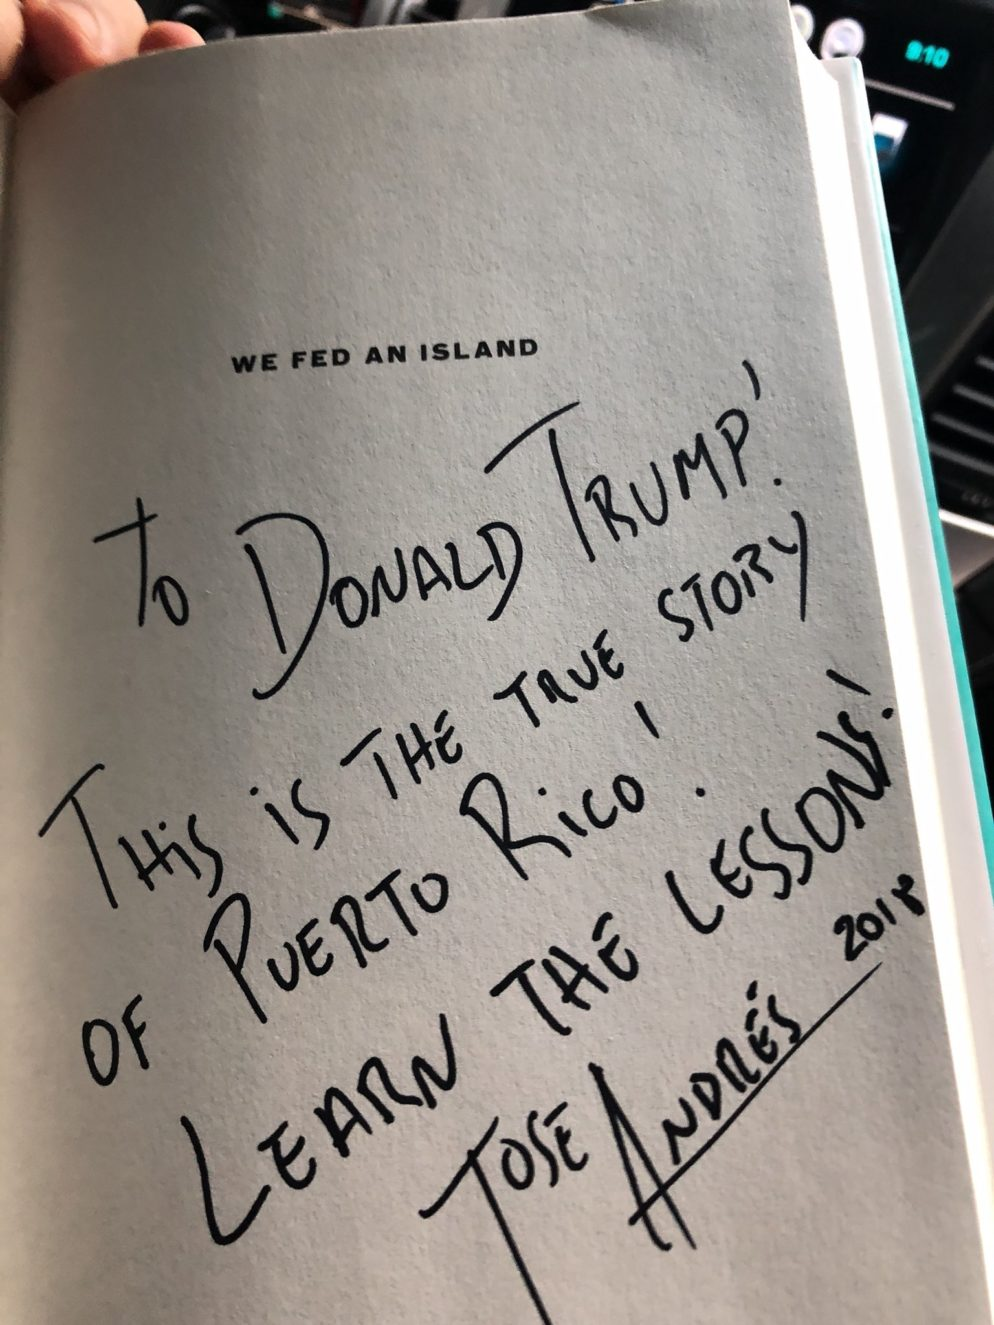 José Andrés Is Schooling Donald Trump on Hurricanes (And It's Great)